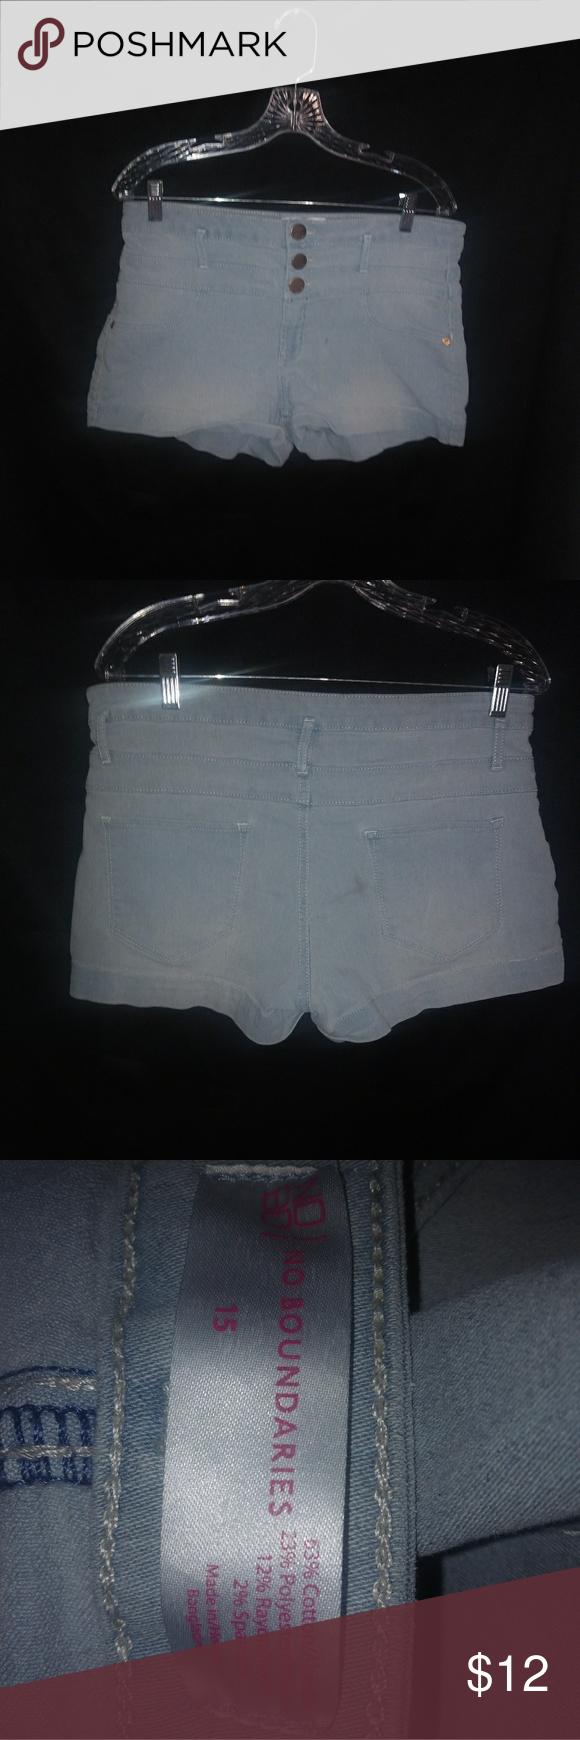 Super Light Blue Jean Shorts Sz 15 Plus Still cute! No Boundaries Shorts Jean Shorts #lightblueshorts Super Light Blue Jean Shorts Sz 15 Plus Still cute! No Boundaries Shorts Jean Shorts #lightblueshorts